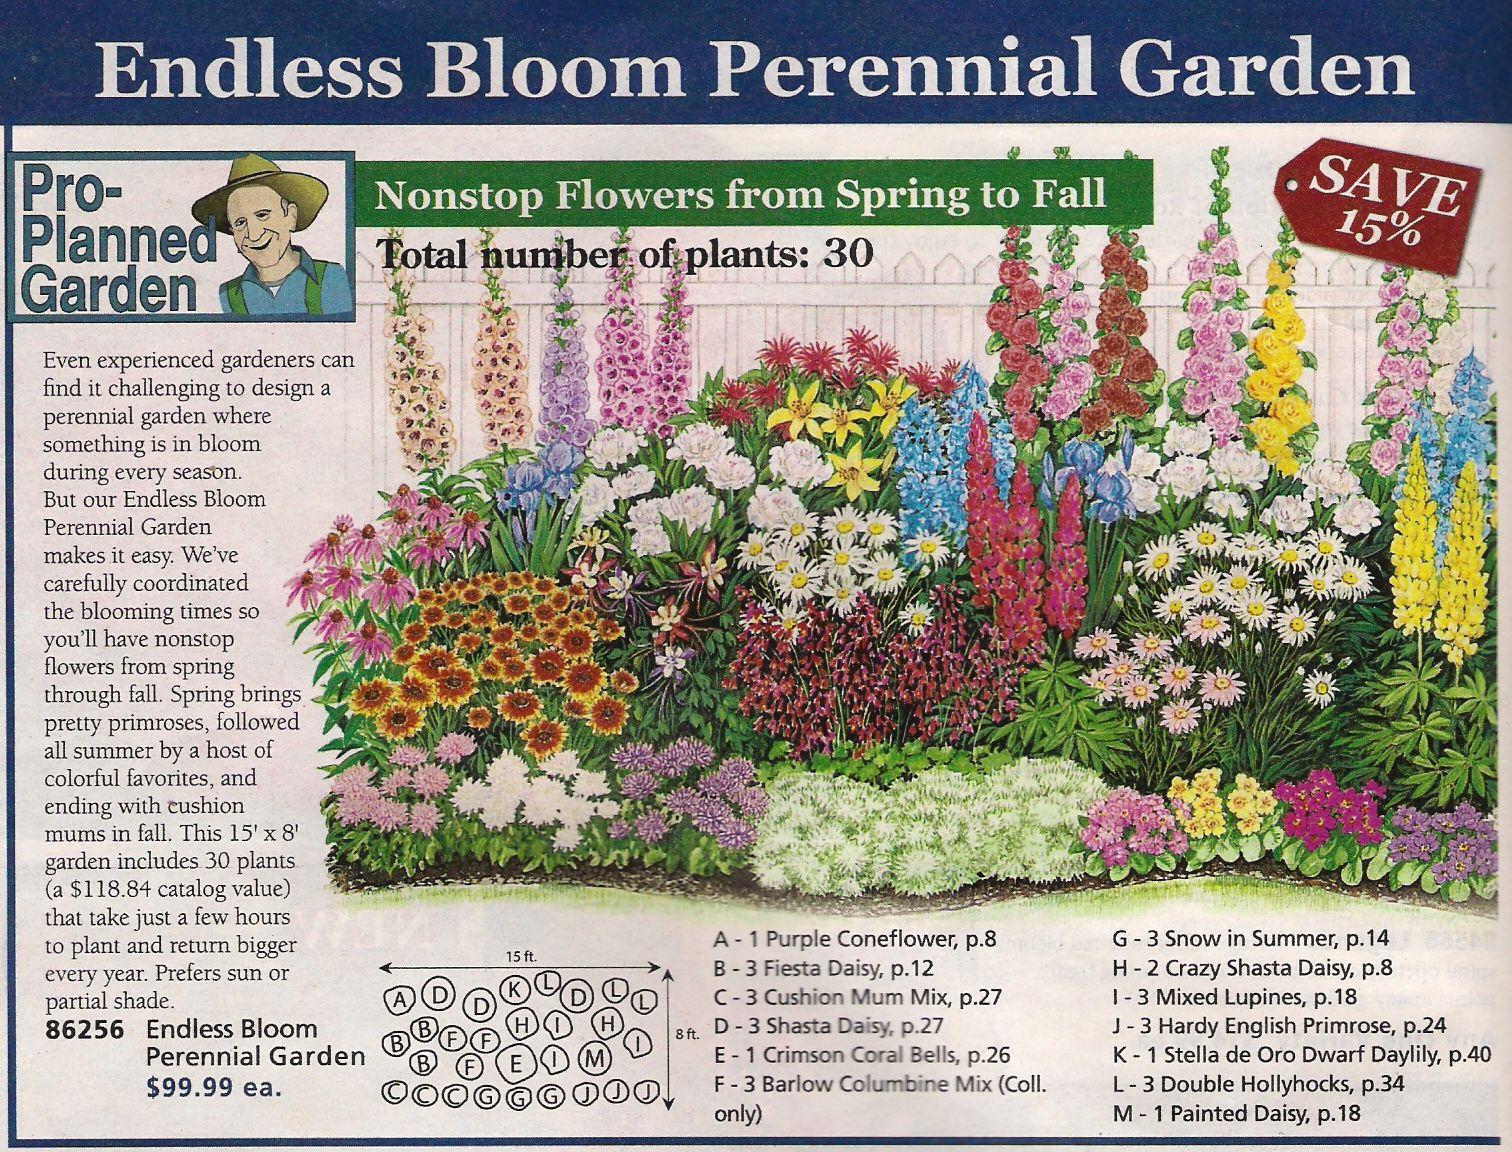 Perennial Bed Plan From Michigan Bulb Co West Garden Perennial